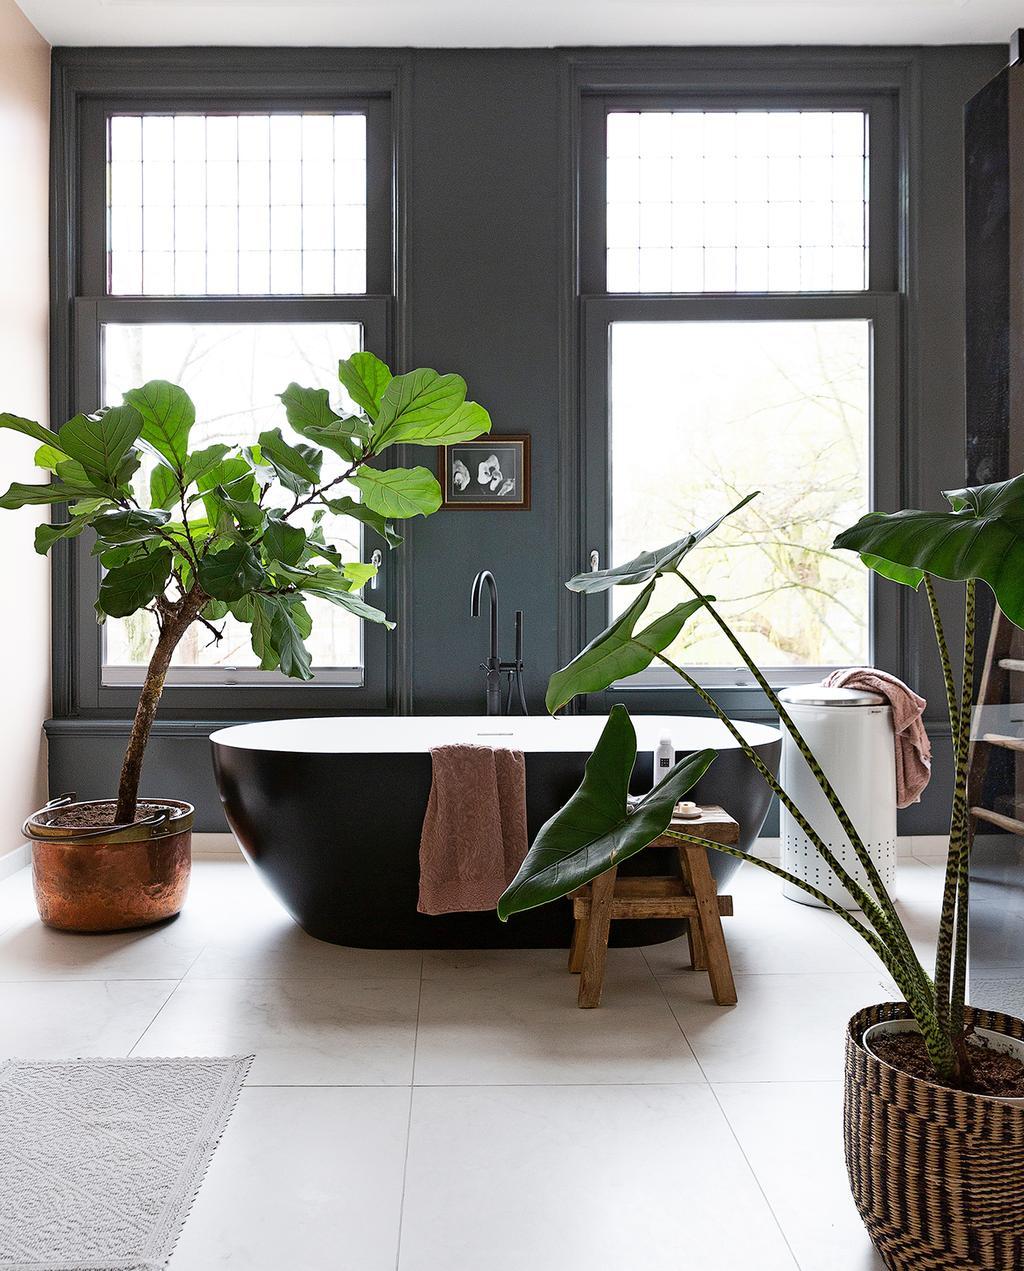 vtwonen 04-2020 | zwart losstaande badkamer